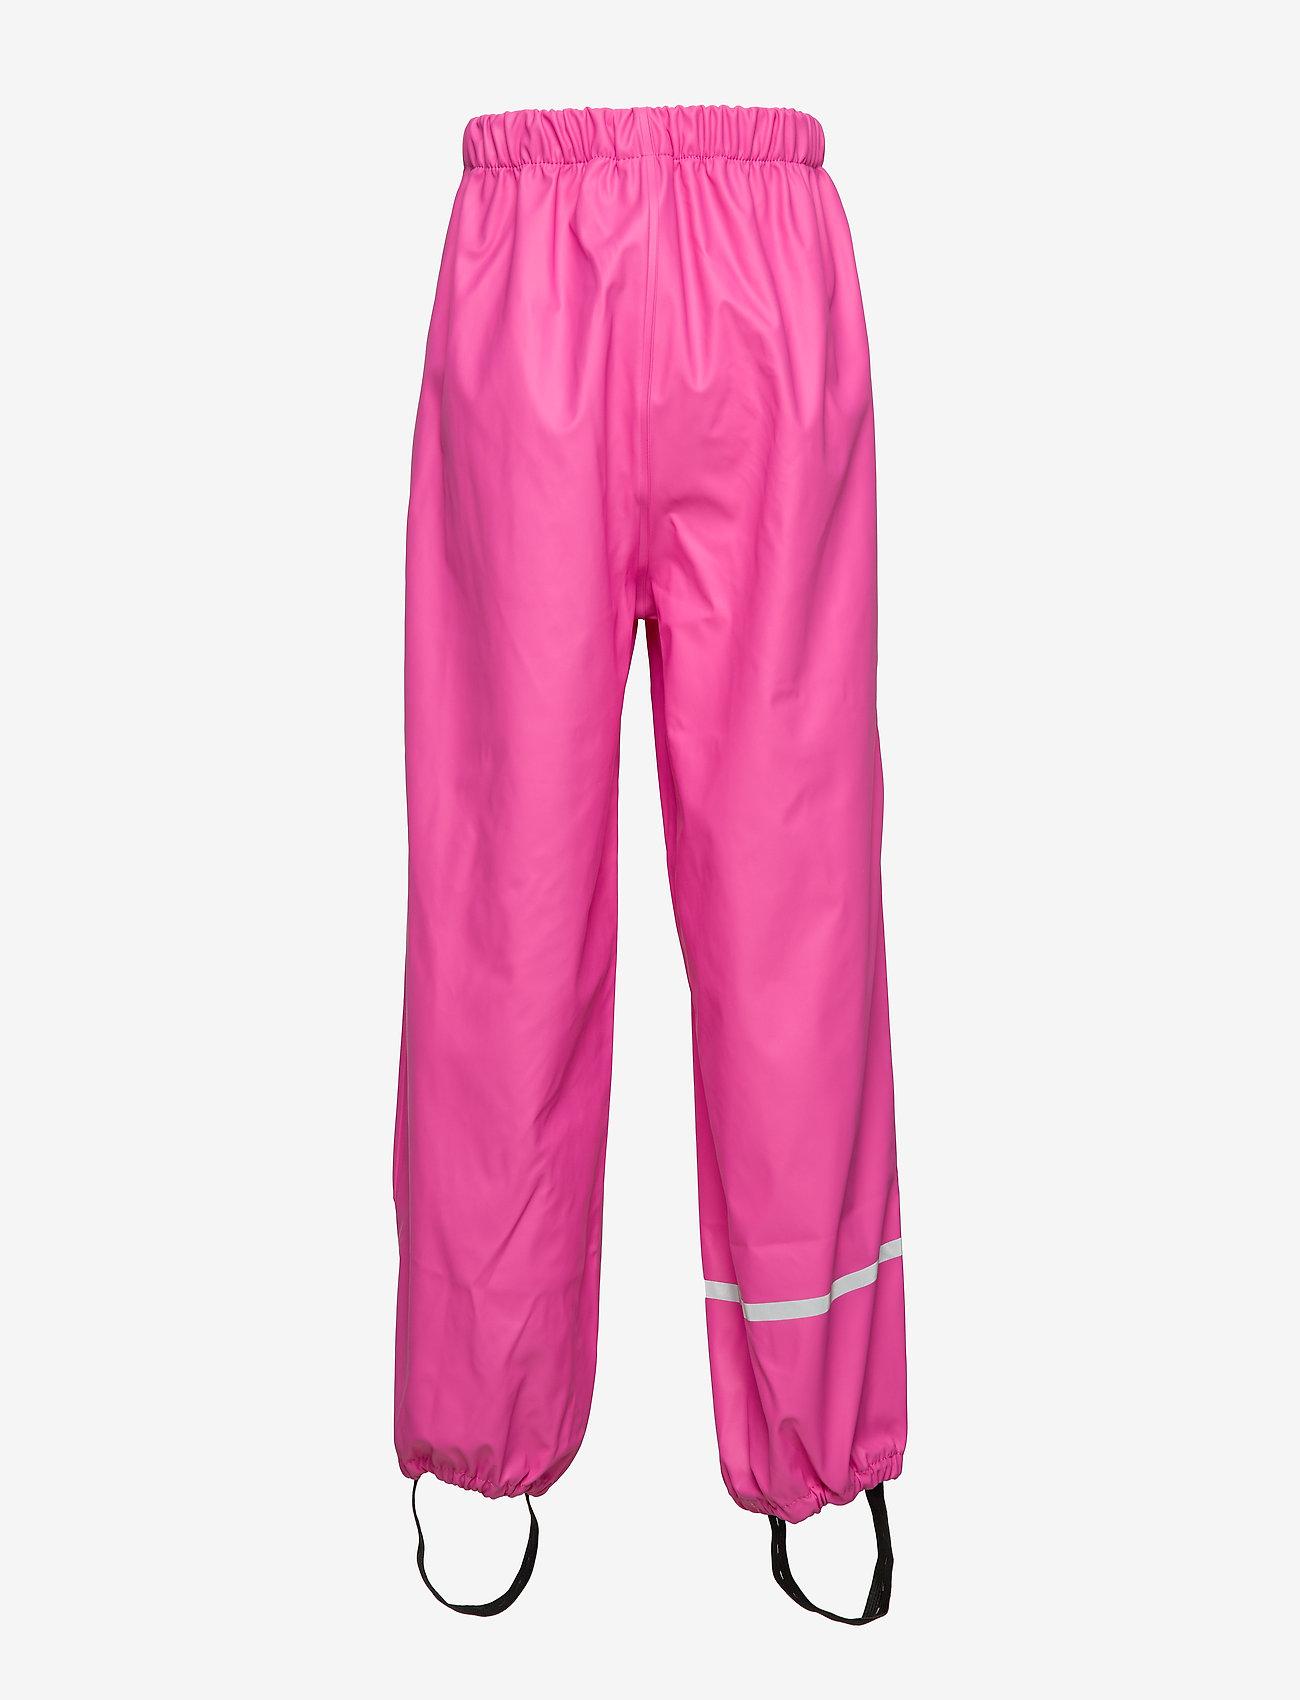 CeLaVi - Rainwear pants, solid - hosen - real pink